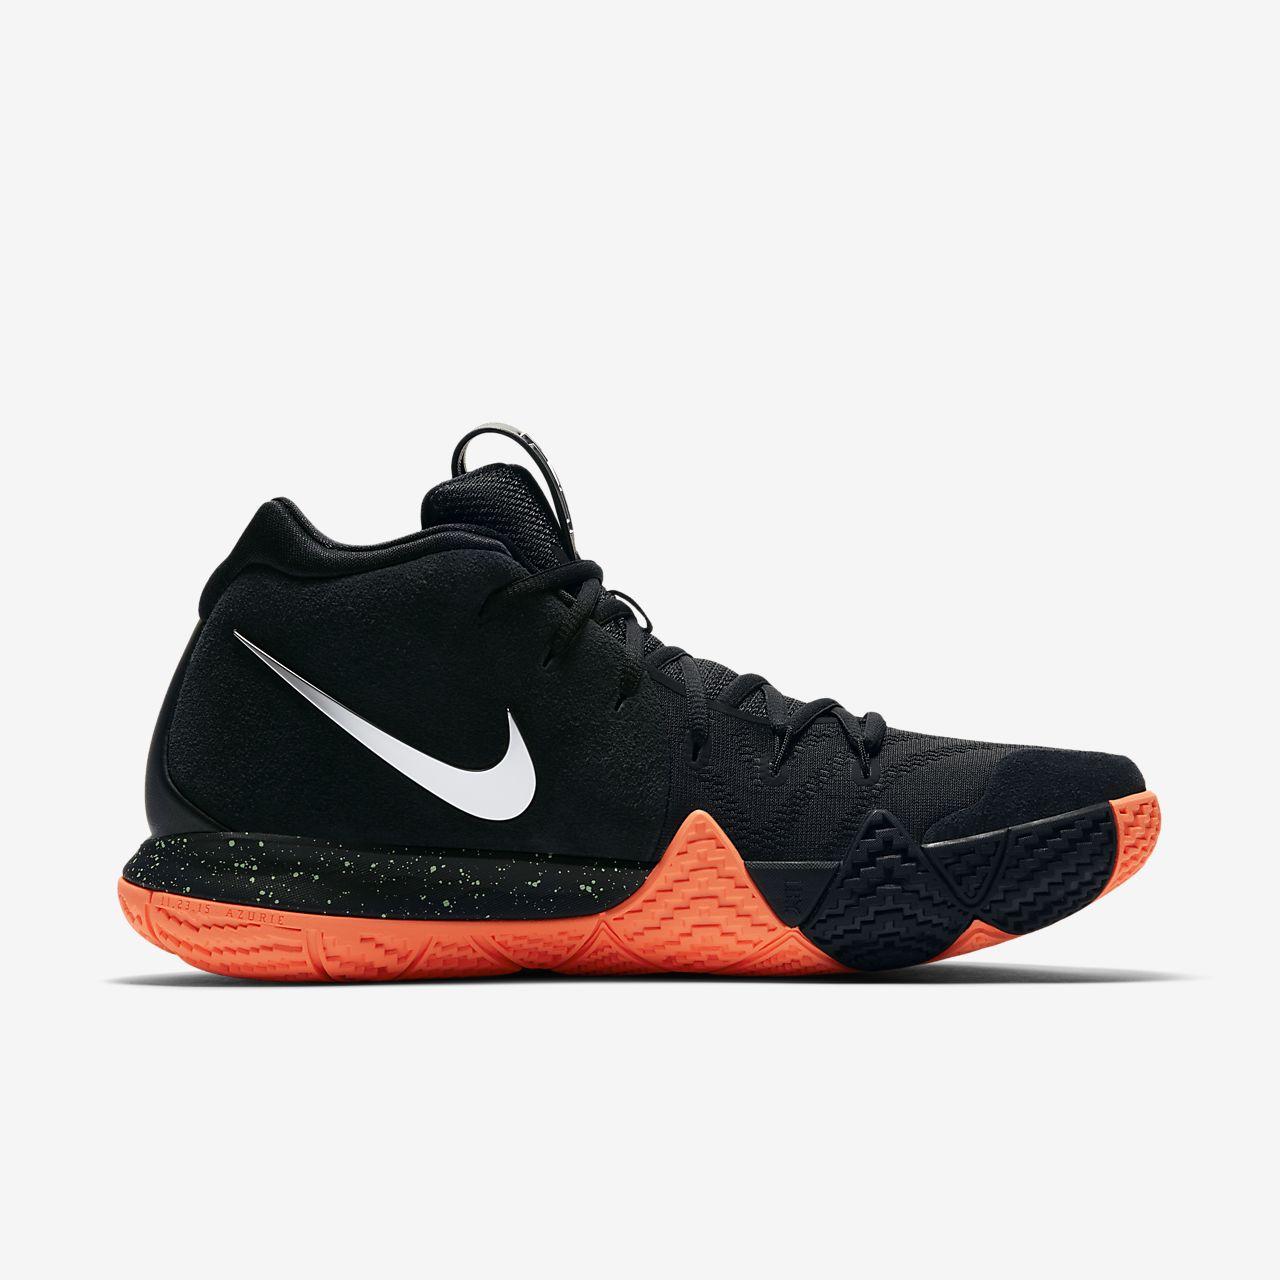 02-nike-kyrie-4-black-silver-orange-943806-010